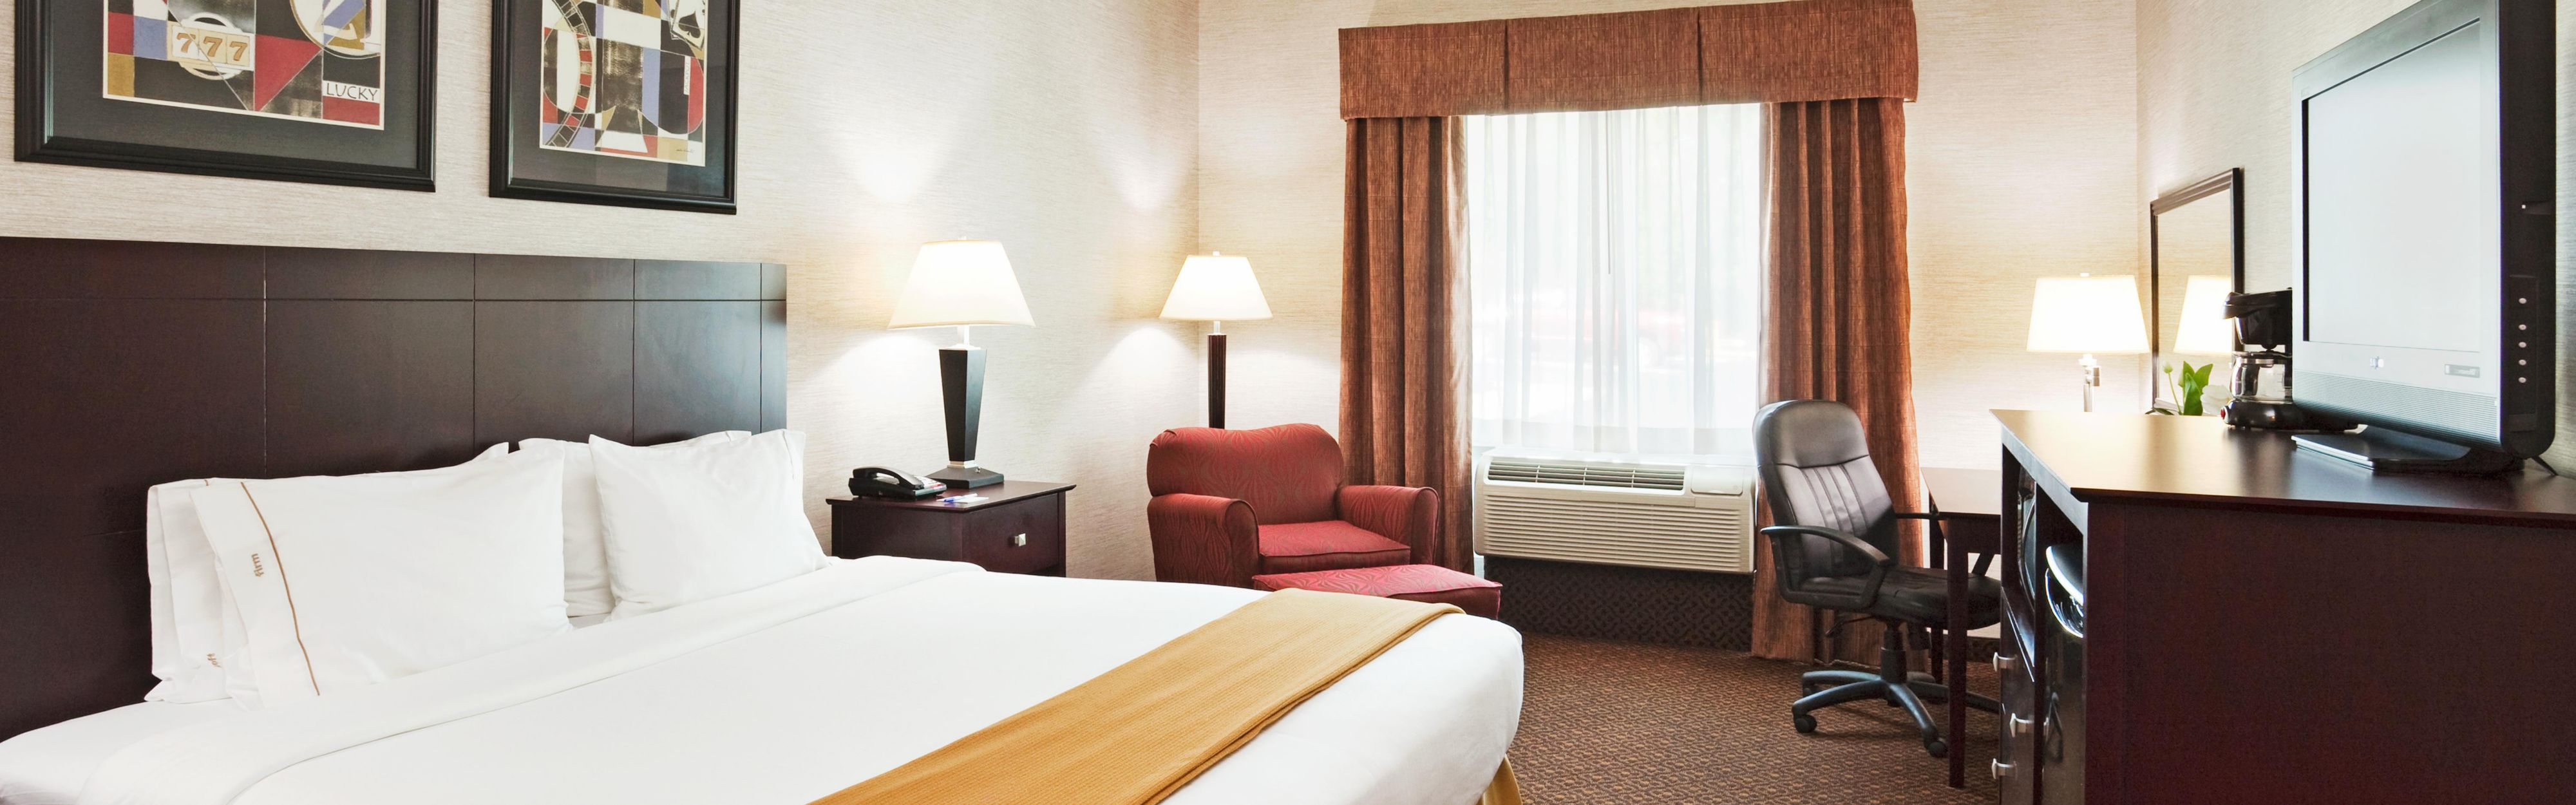 Holiday Inn Express Carrollton image 1